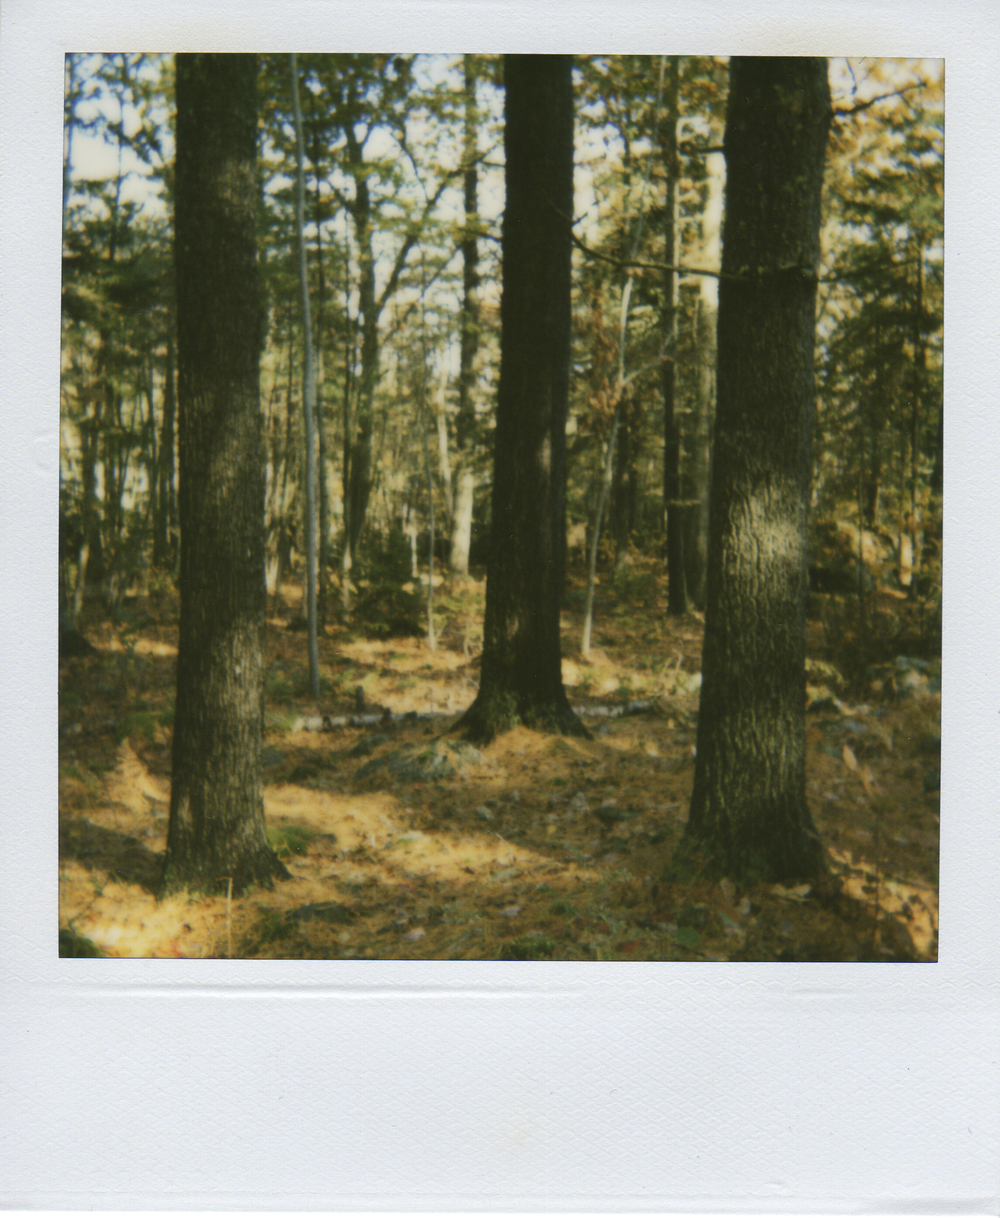 jlaurence-polaroid-140.jpg